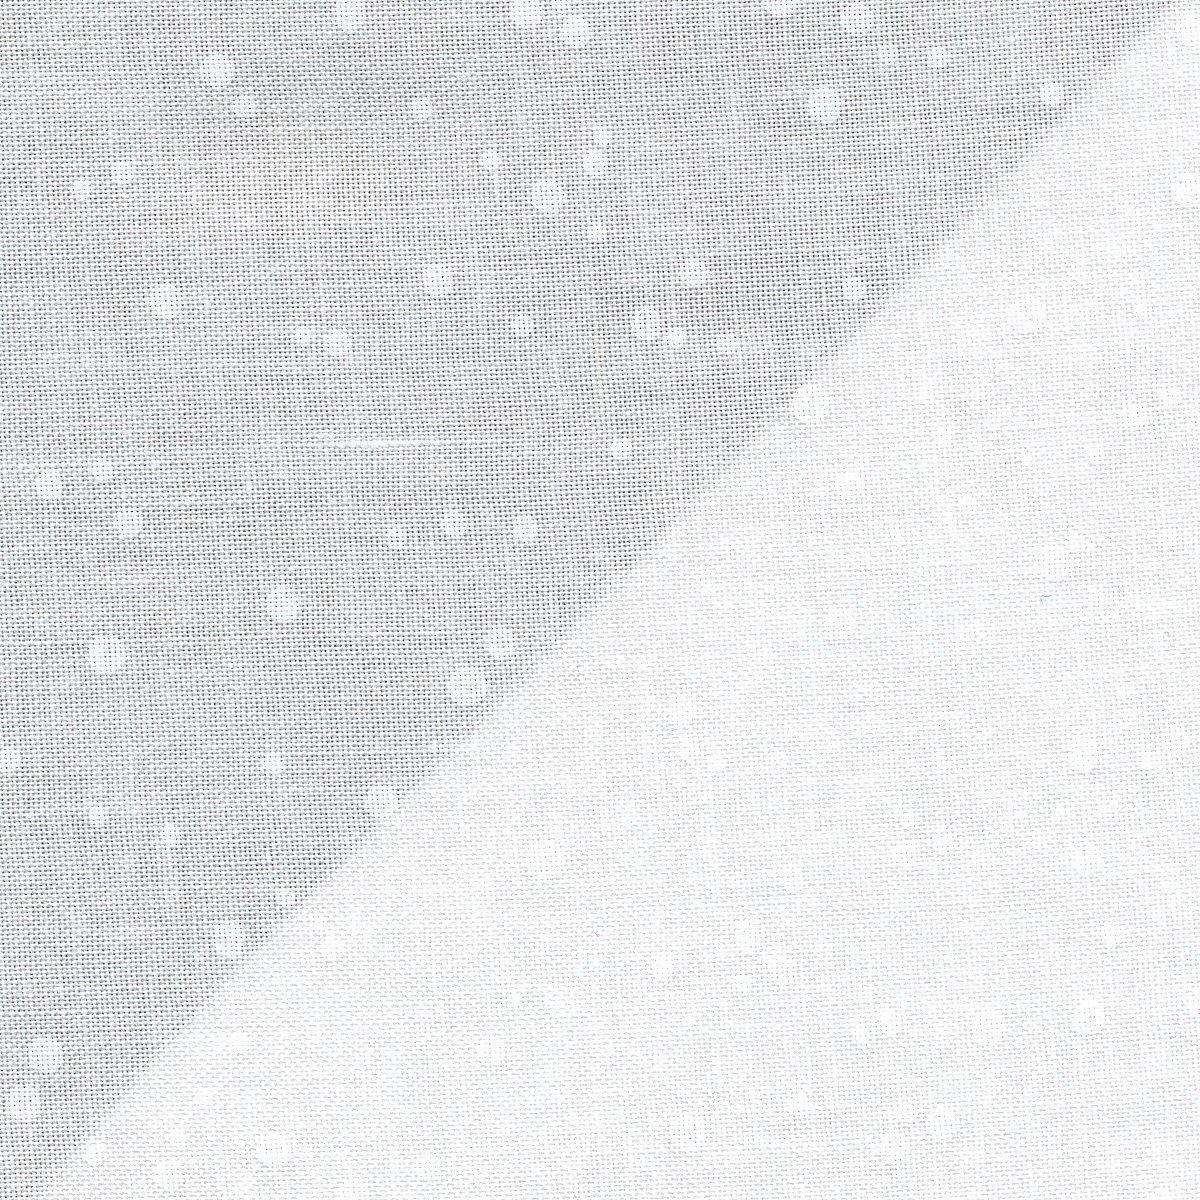 Solitaire Whites - MAS16006-UW